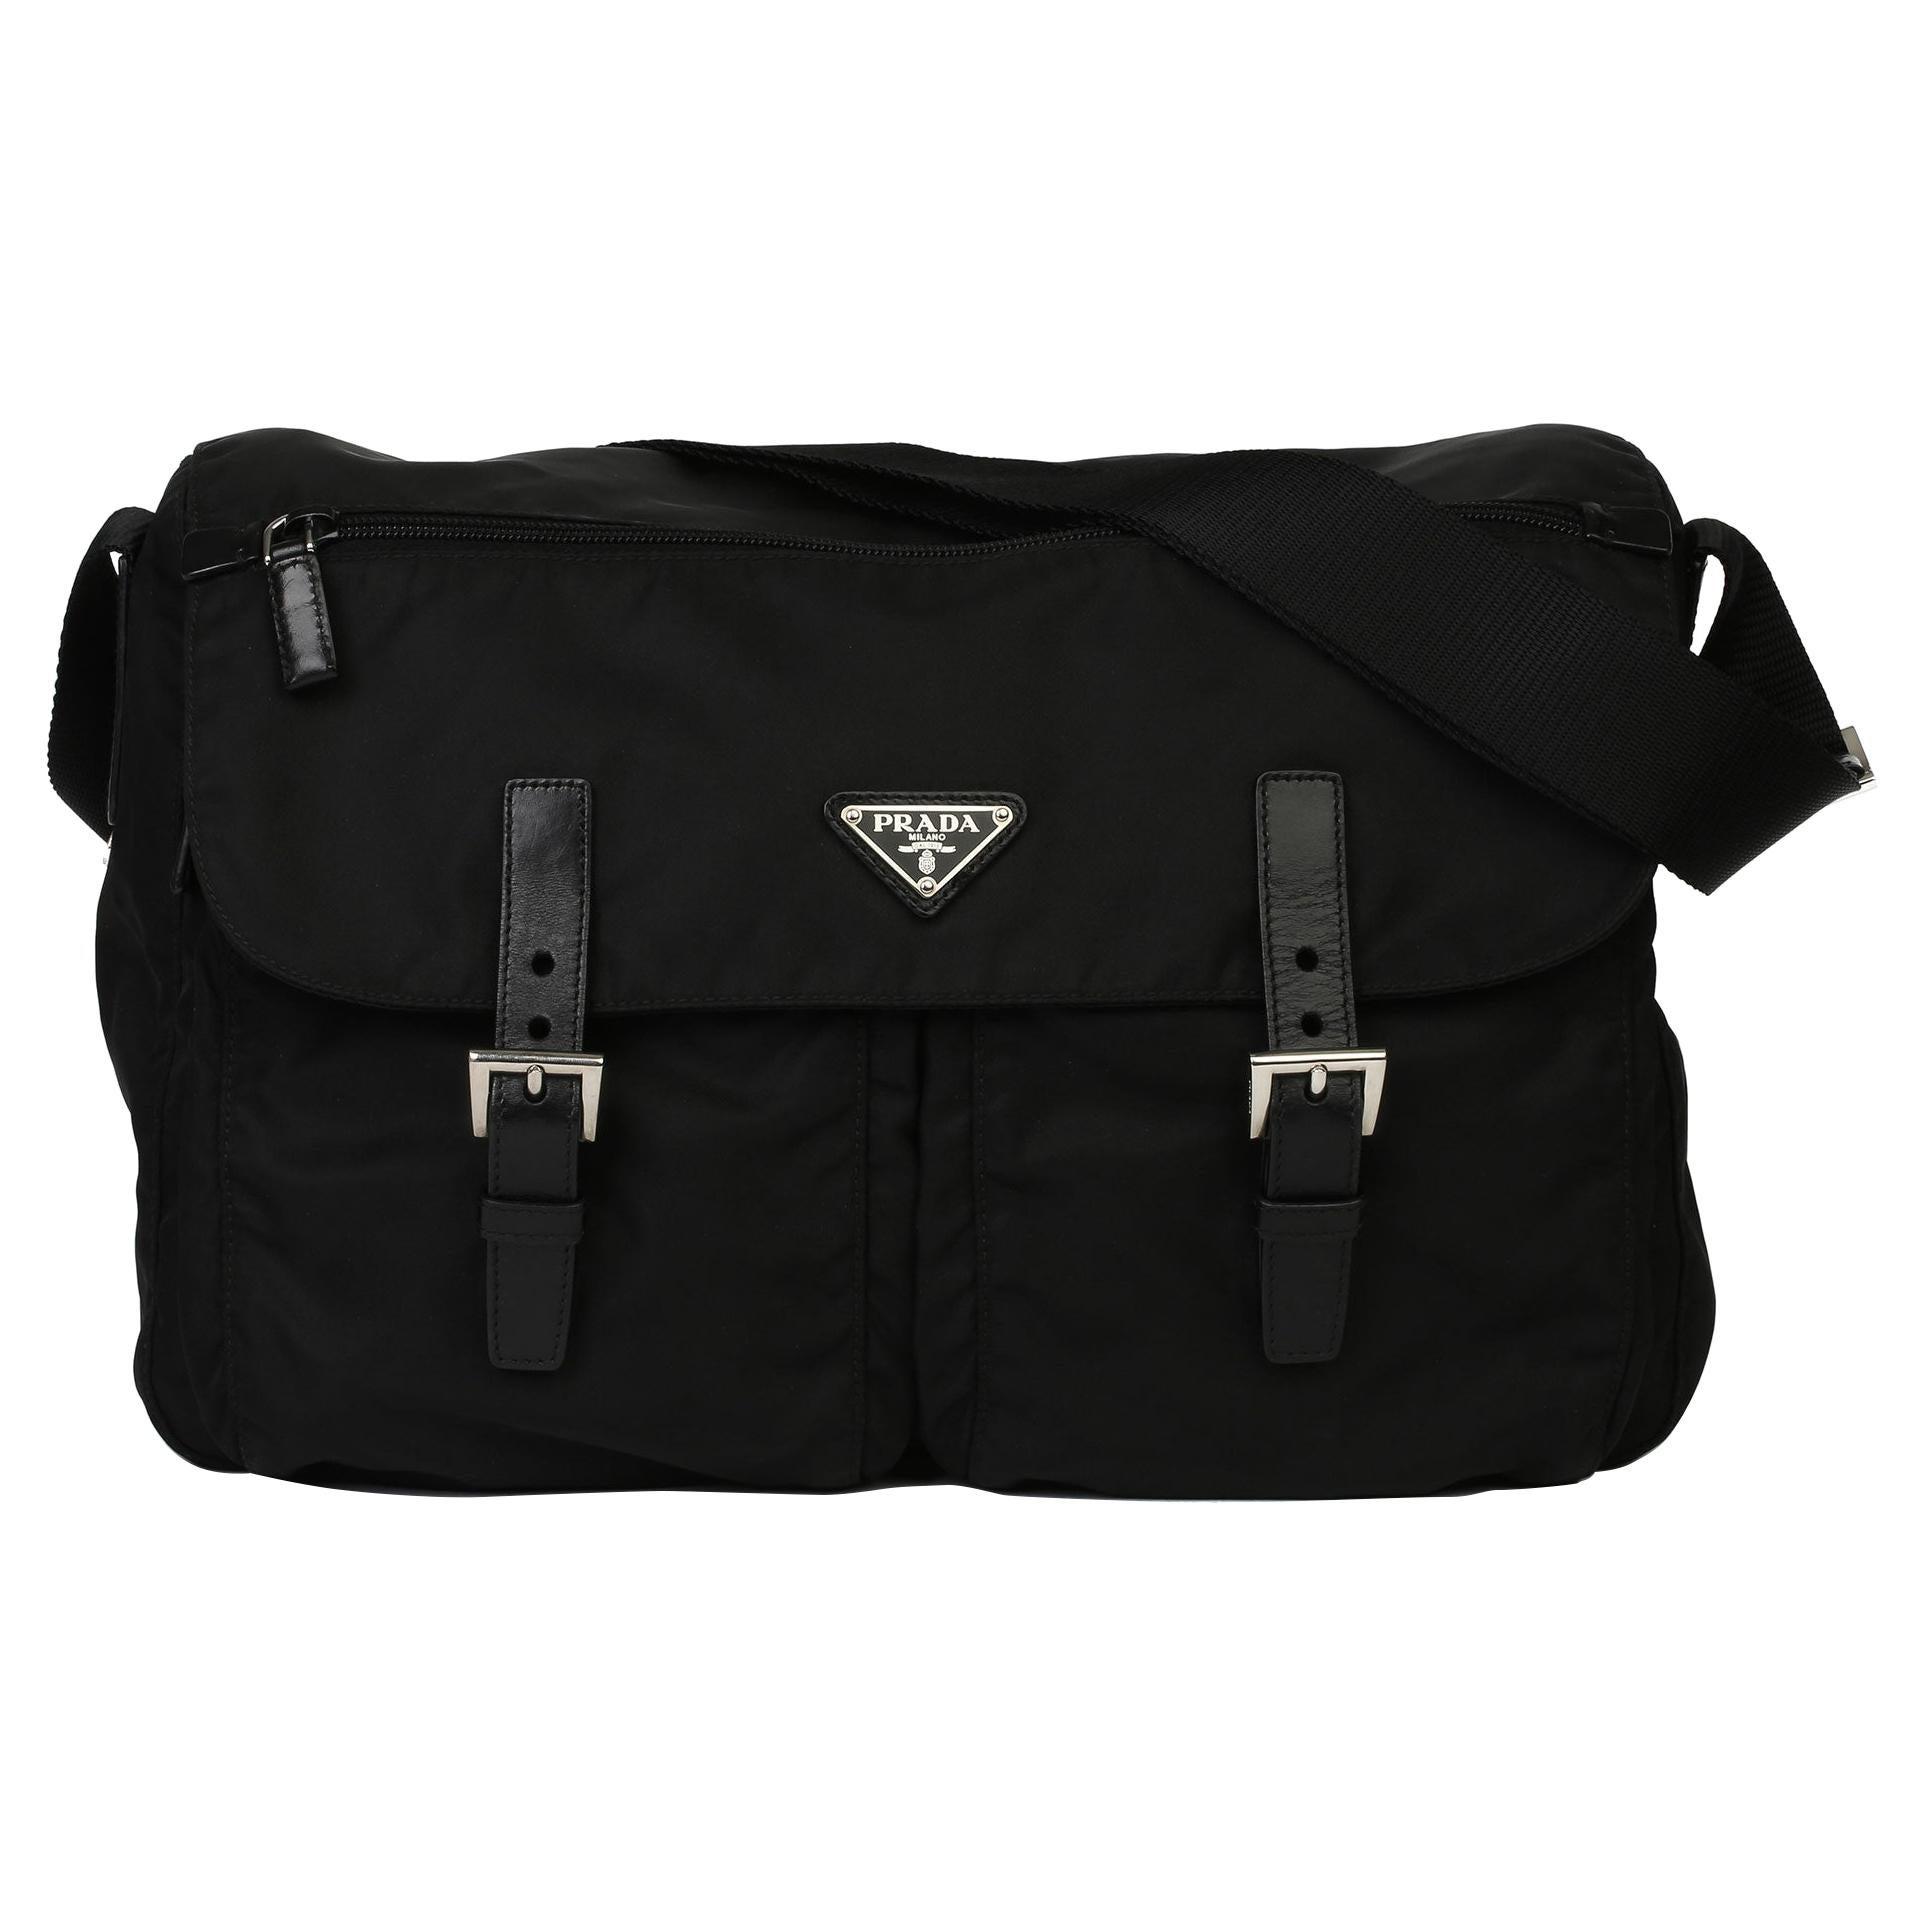 2010 Prada Black Nylon & Calfskin Leather Medium Shoulder Bag